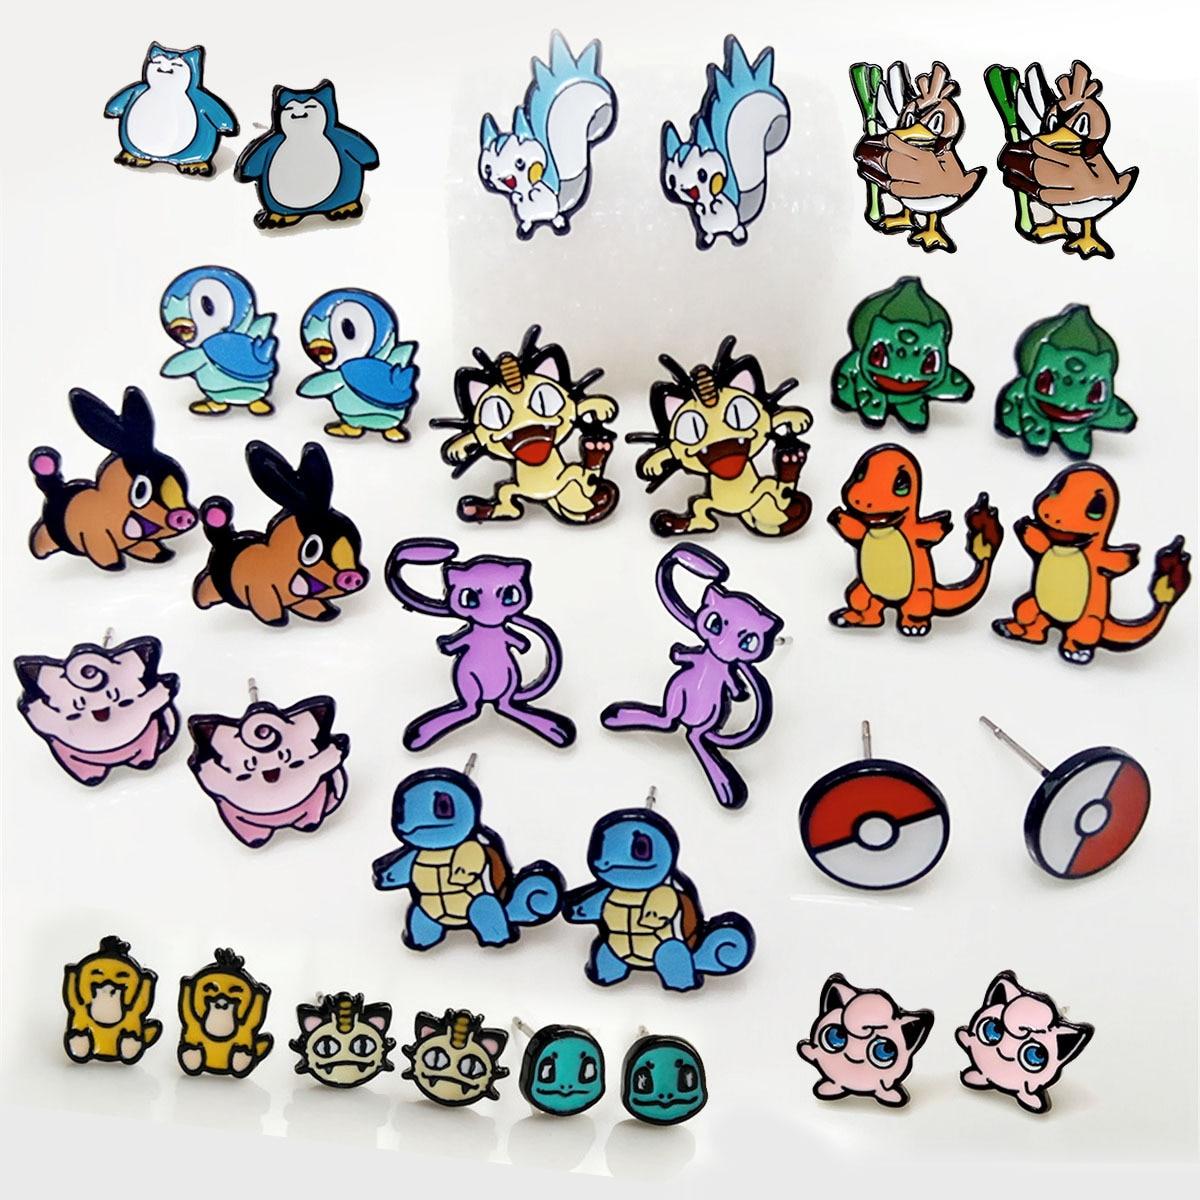 Pokemon lindo pendientes para Cosplay juego Anime de dibujos animados Charmander Meowth Psyduck Jigglypuff Pokemon RAICHU pendientes de tuerca joyas